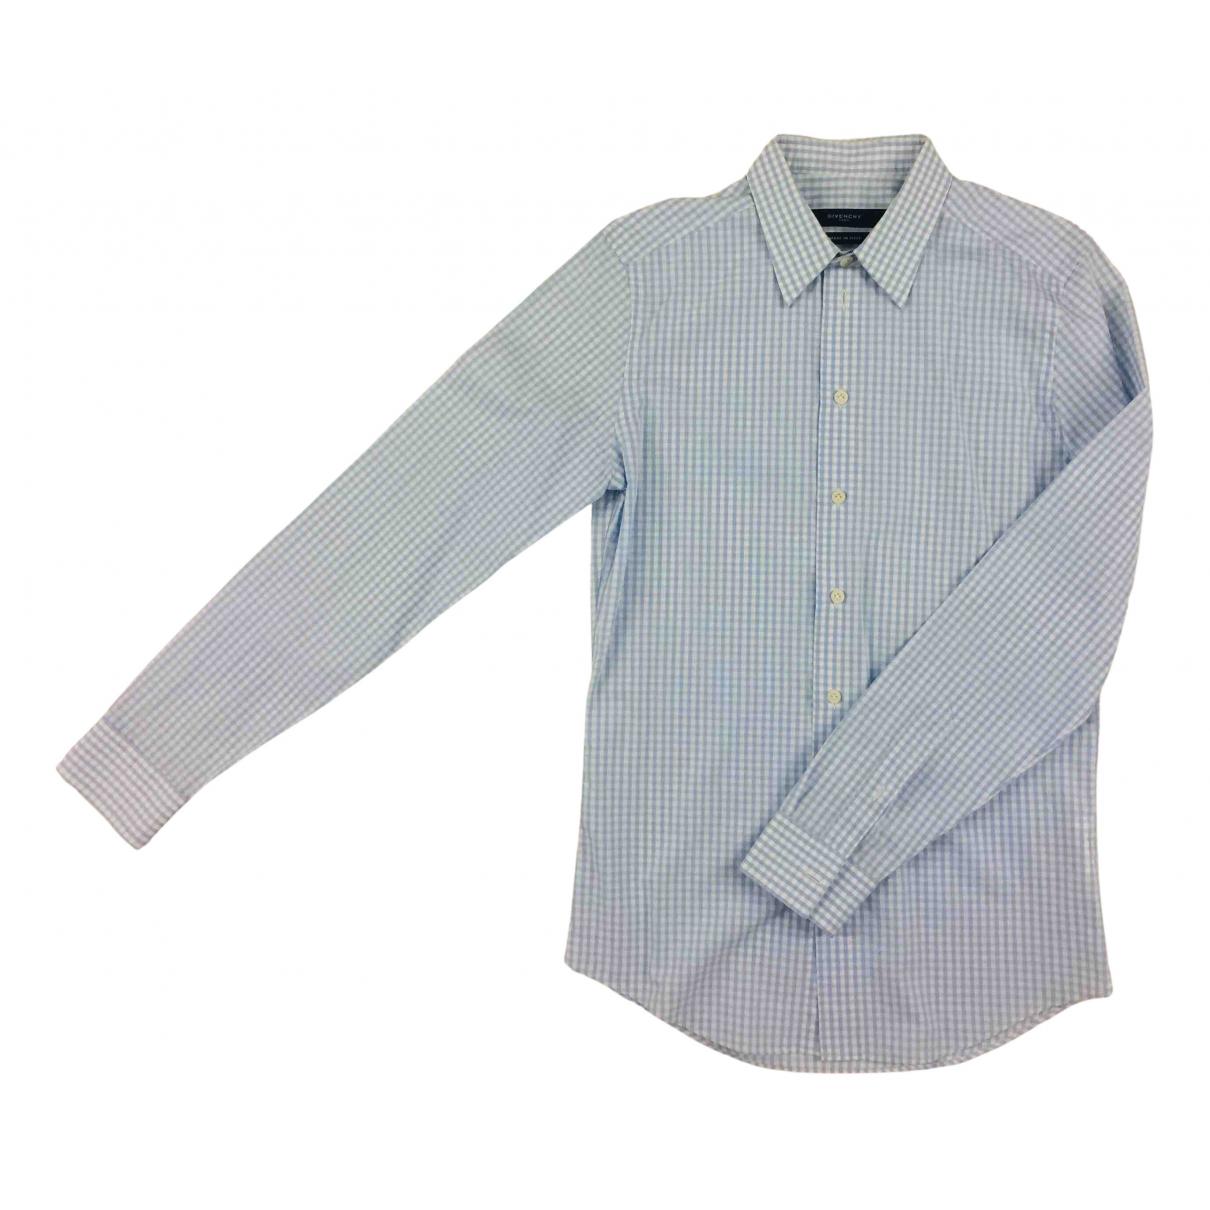 Givenchy N Blue Cotton Shirts for Men 39 EU (tour de cou / collar)